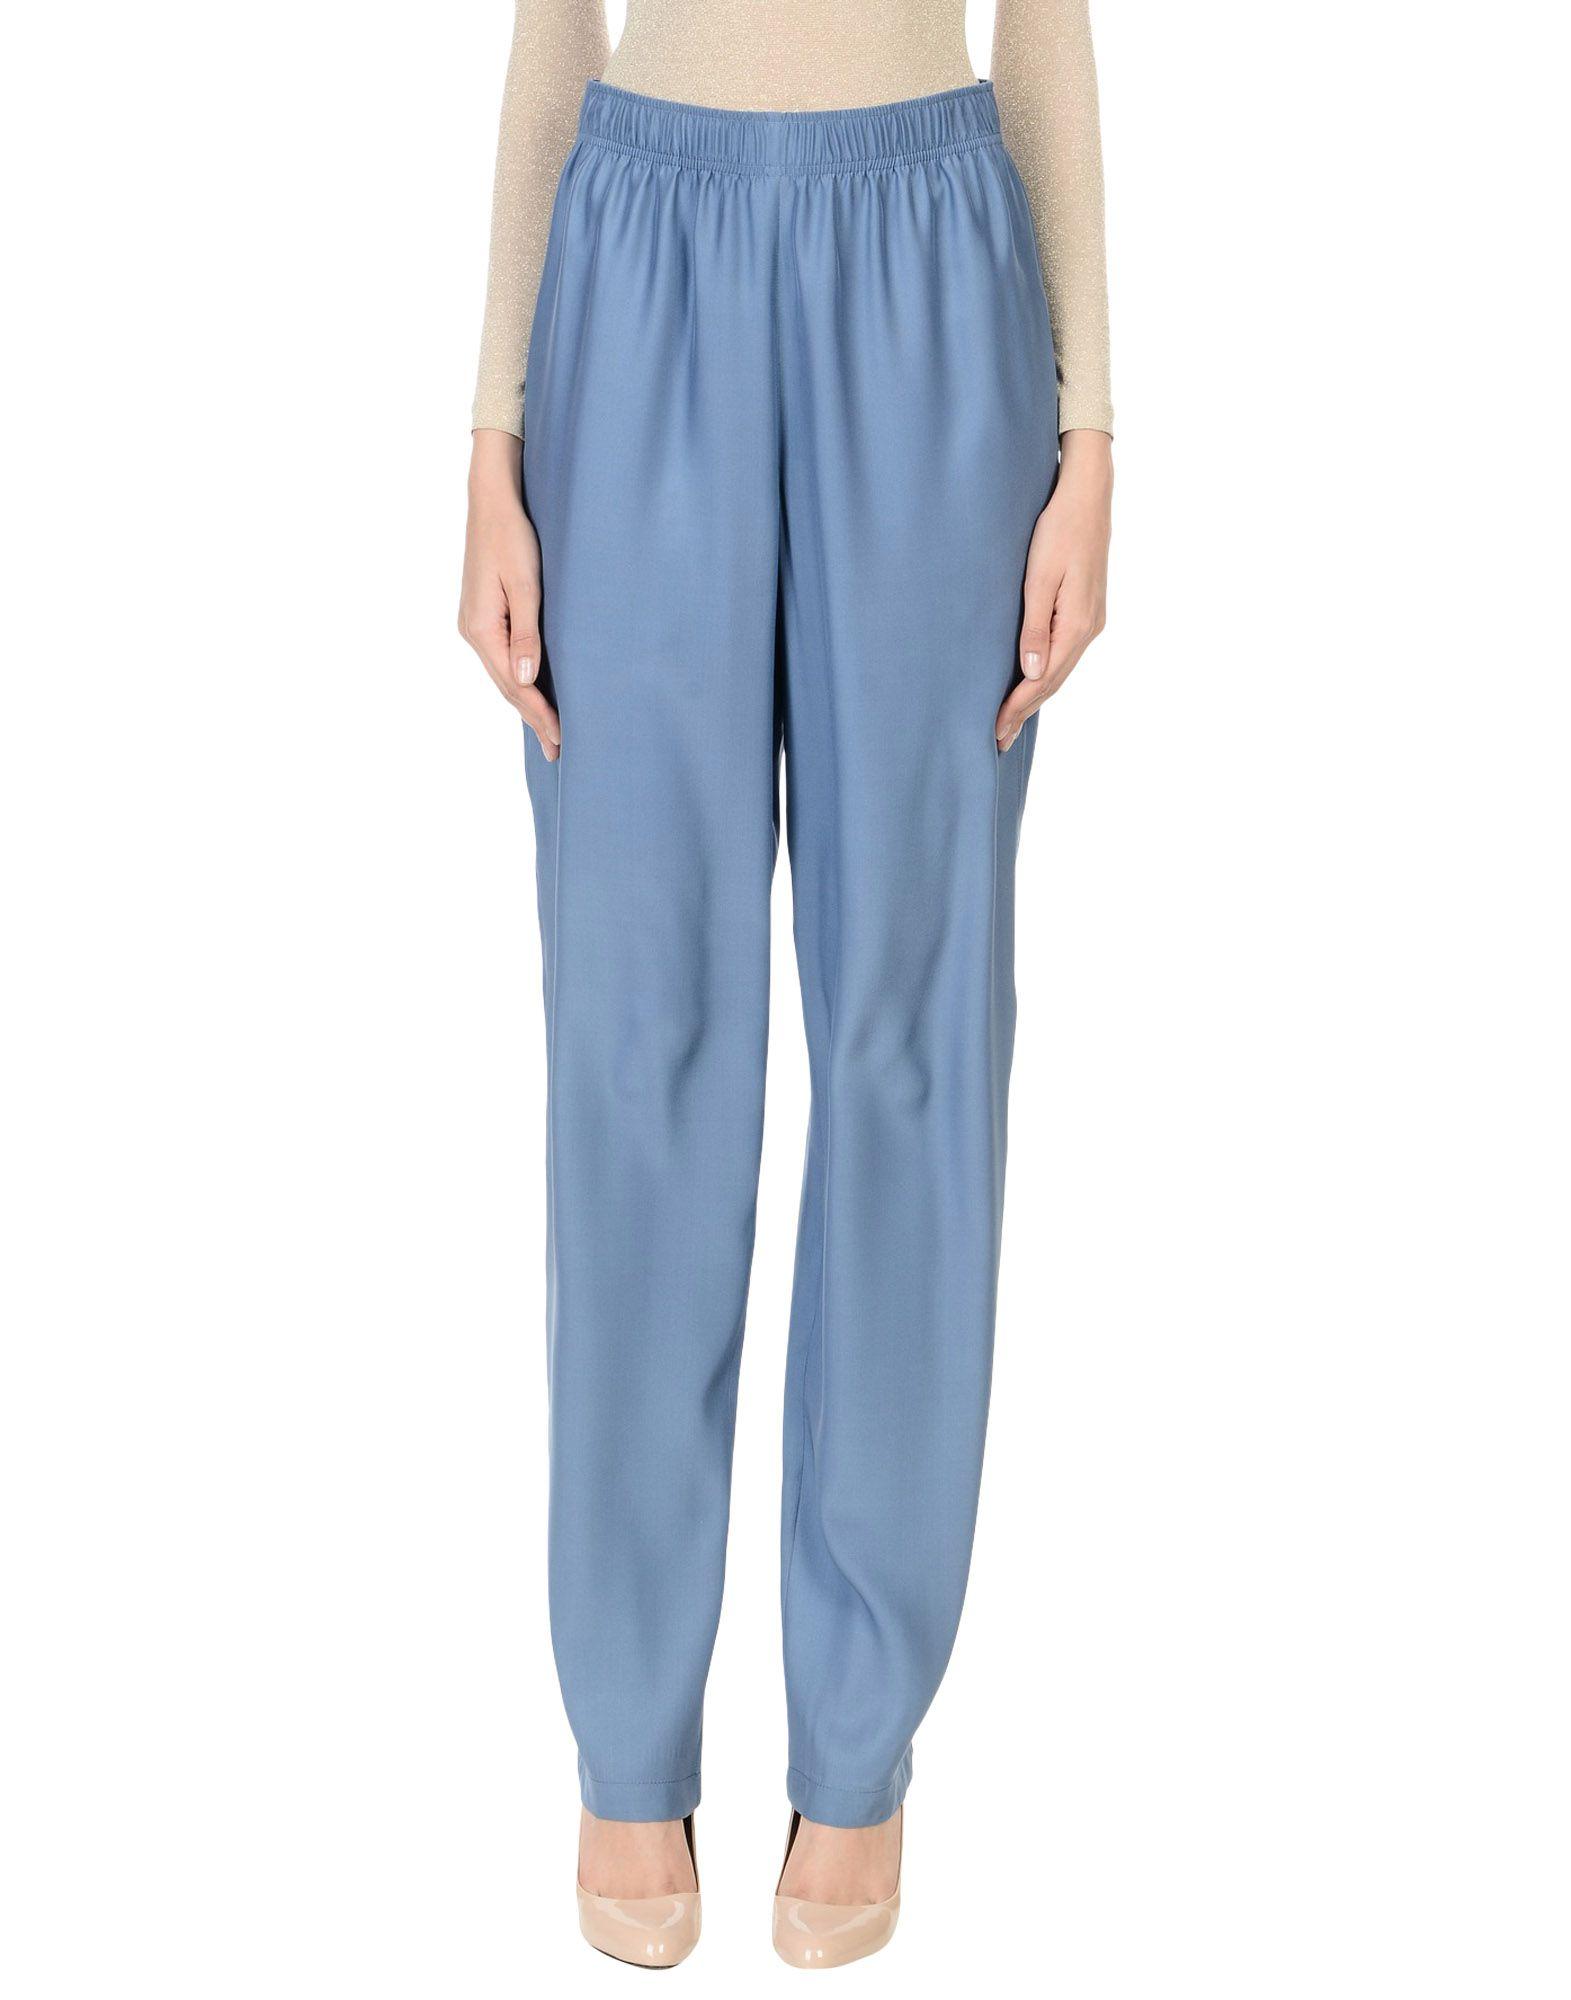 Pantalone Stella Mccartney Donna - Acquista online su 0YqFEqUf